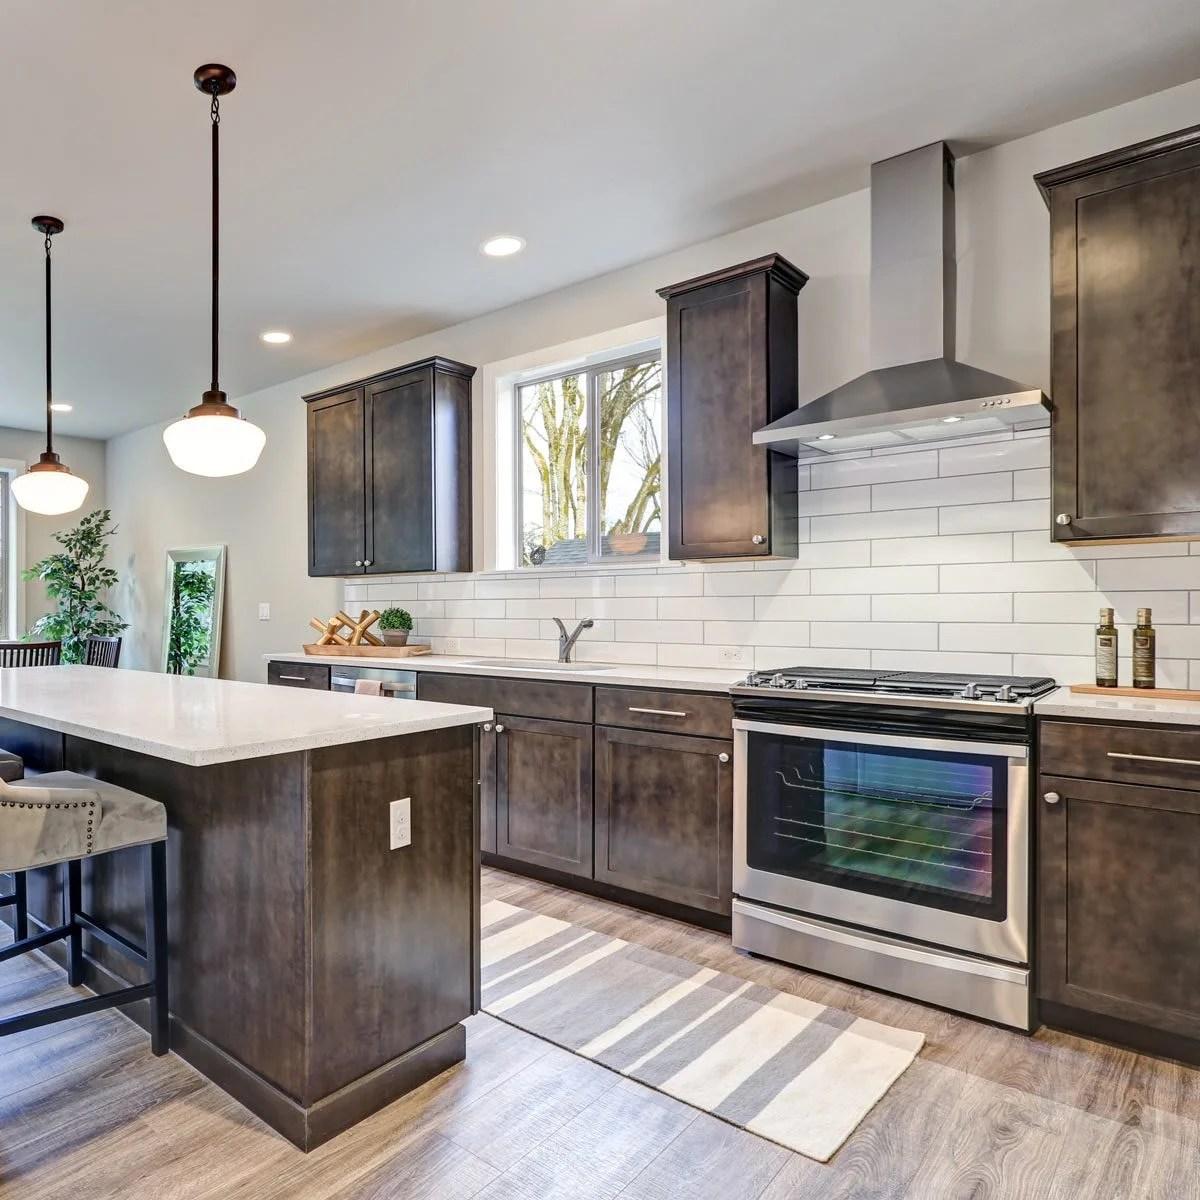 Best Kitchen Backsplash Ideas For Dark Cabinets | Family ... on Backsplash For Dark Countertops  id=40125